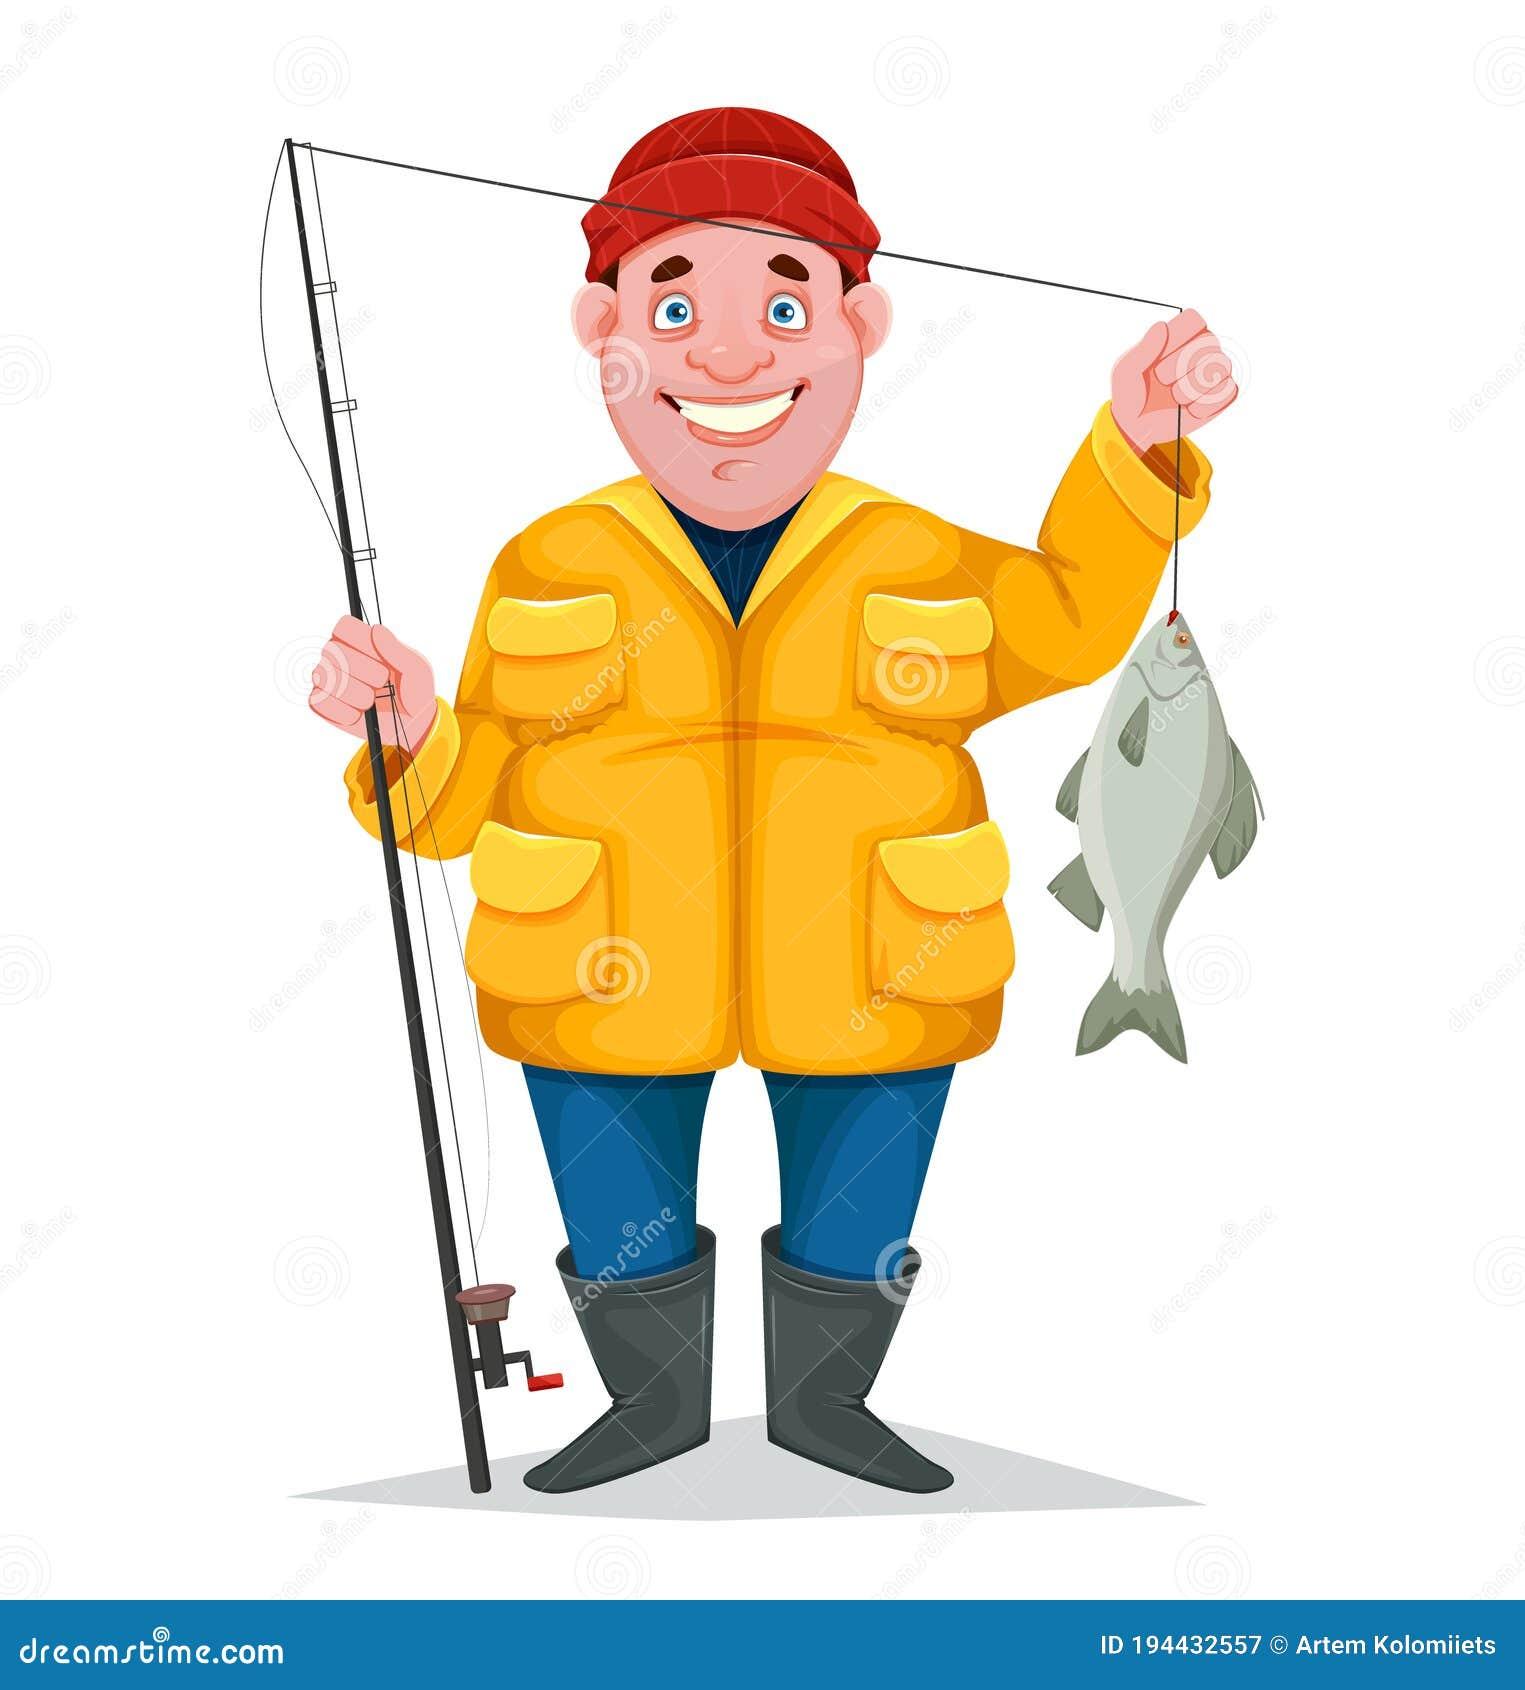 Caught Fish Stock Illustrations – 737 Caught Fish Stock Illustrations,  Vectors & Clipart - Dreamstime